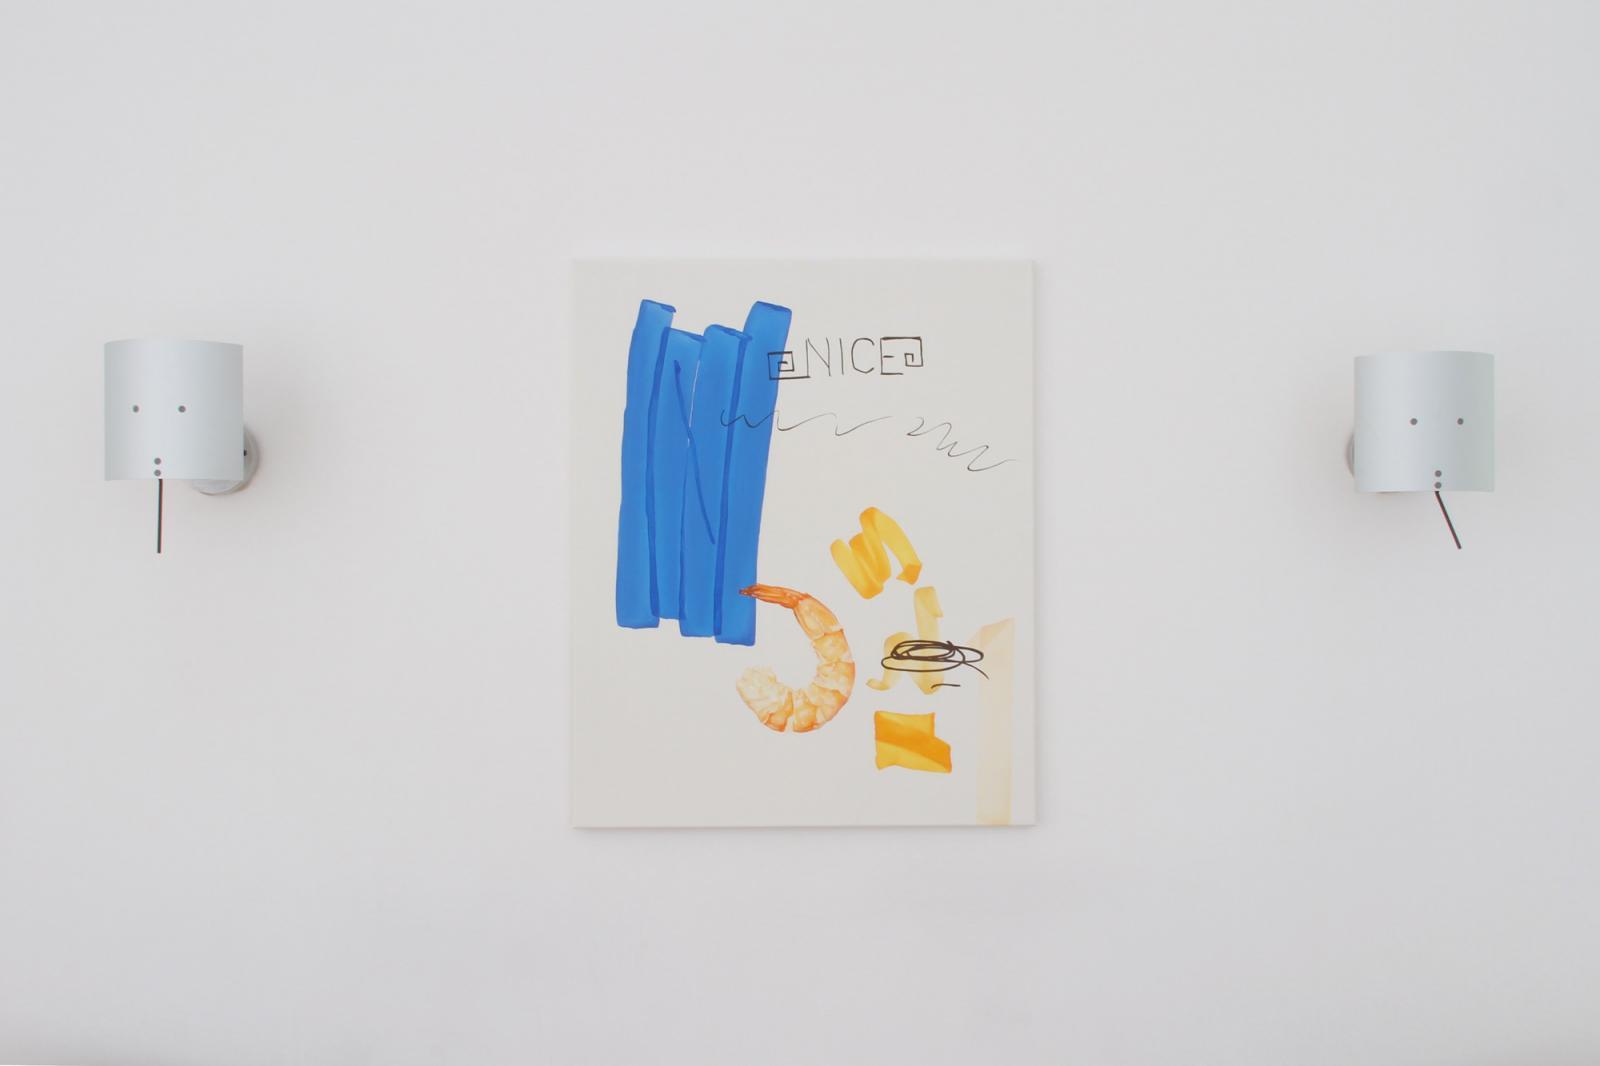 Edgardo Aragón, /Mesoamericana (new grand civilization)/, 2016, mor  charpentier, Paris